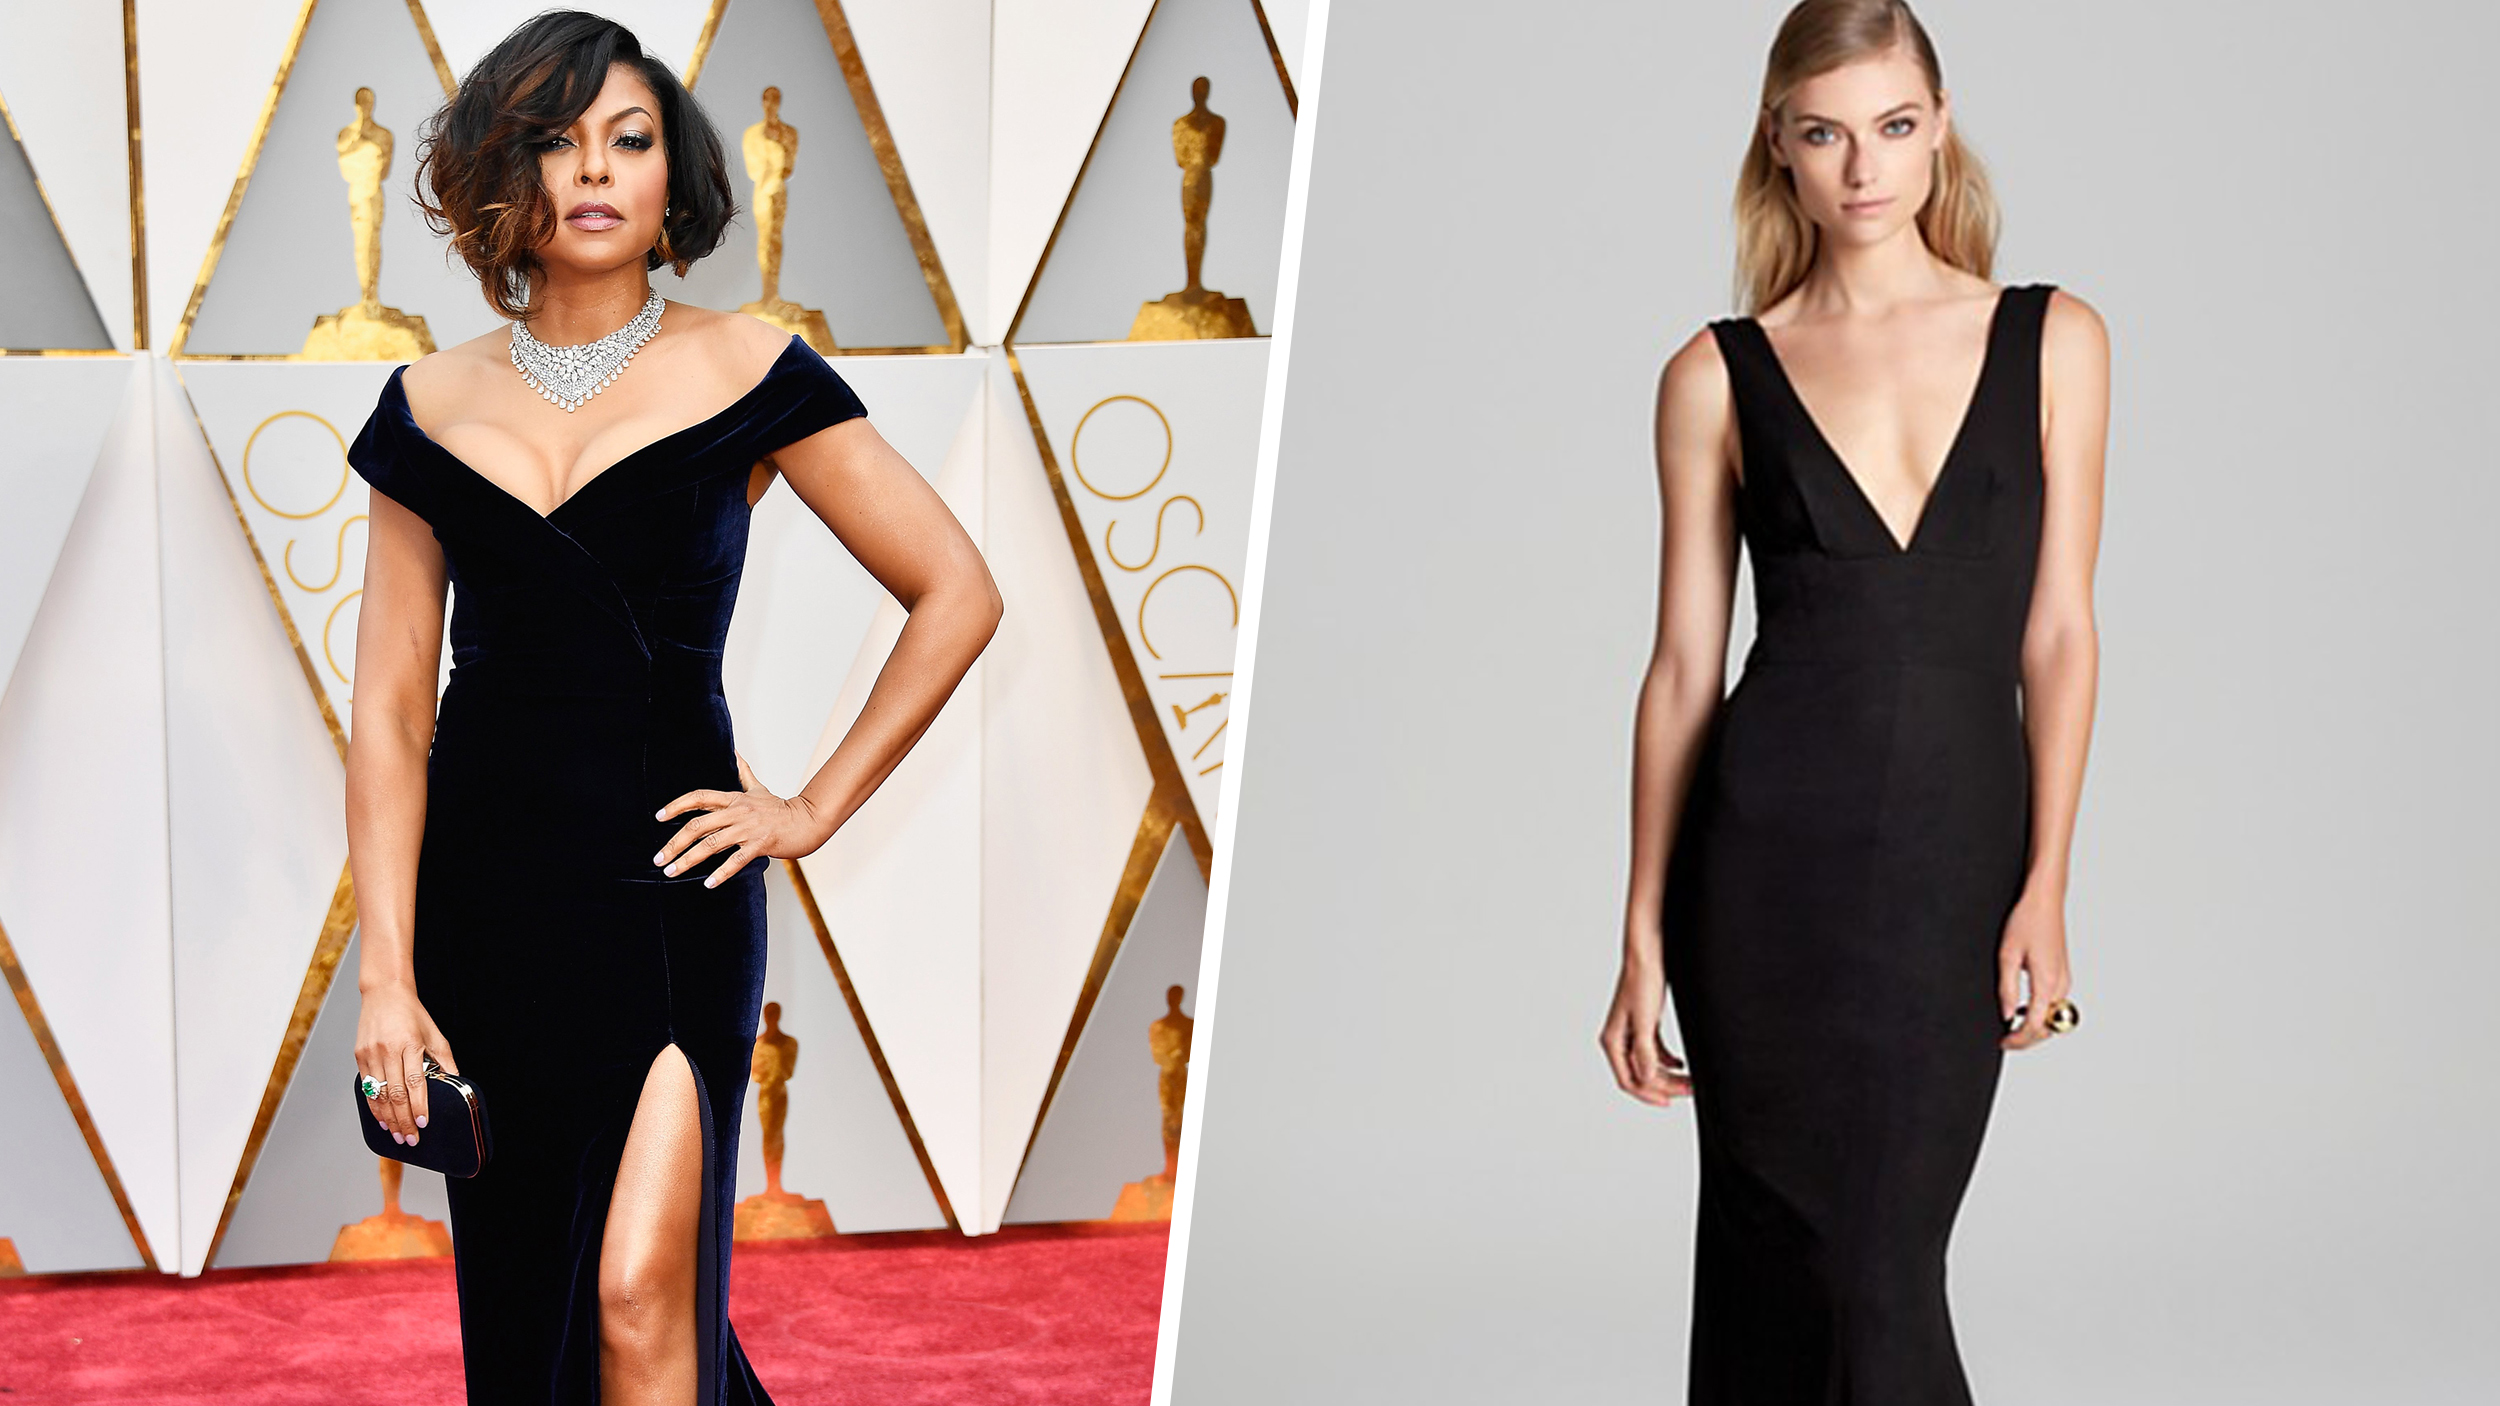 Oscars 2017 red carpet looks for less: Taraji P. Henson, Dakota Johnson